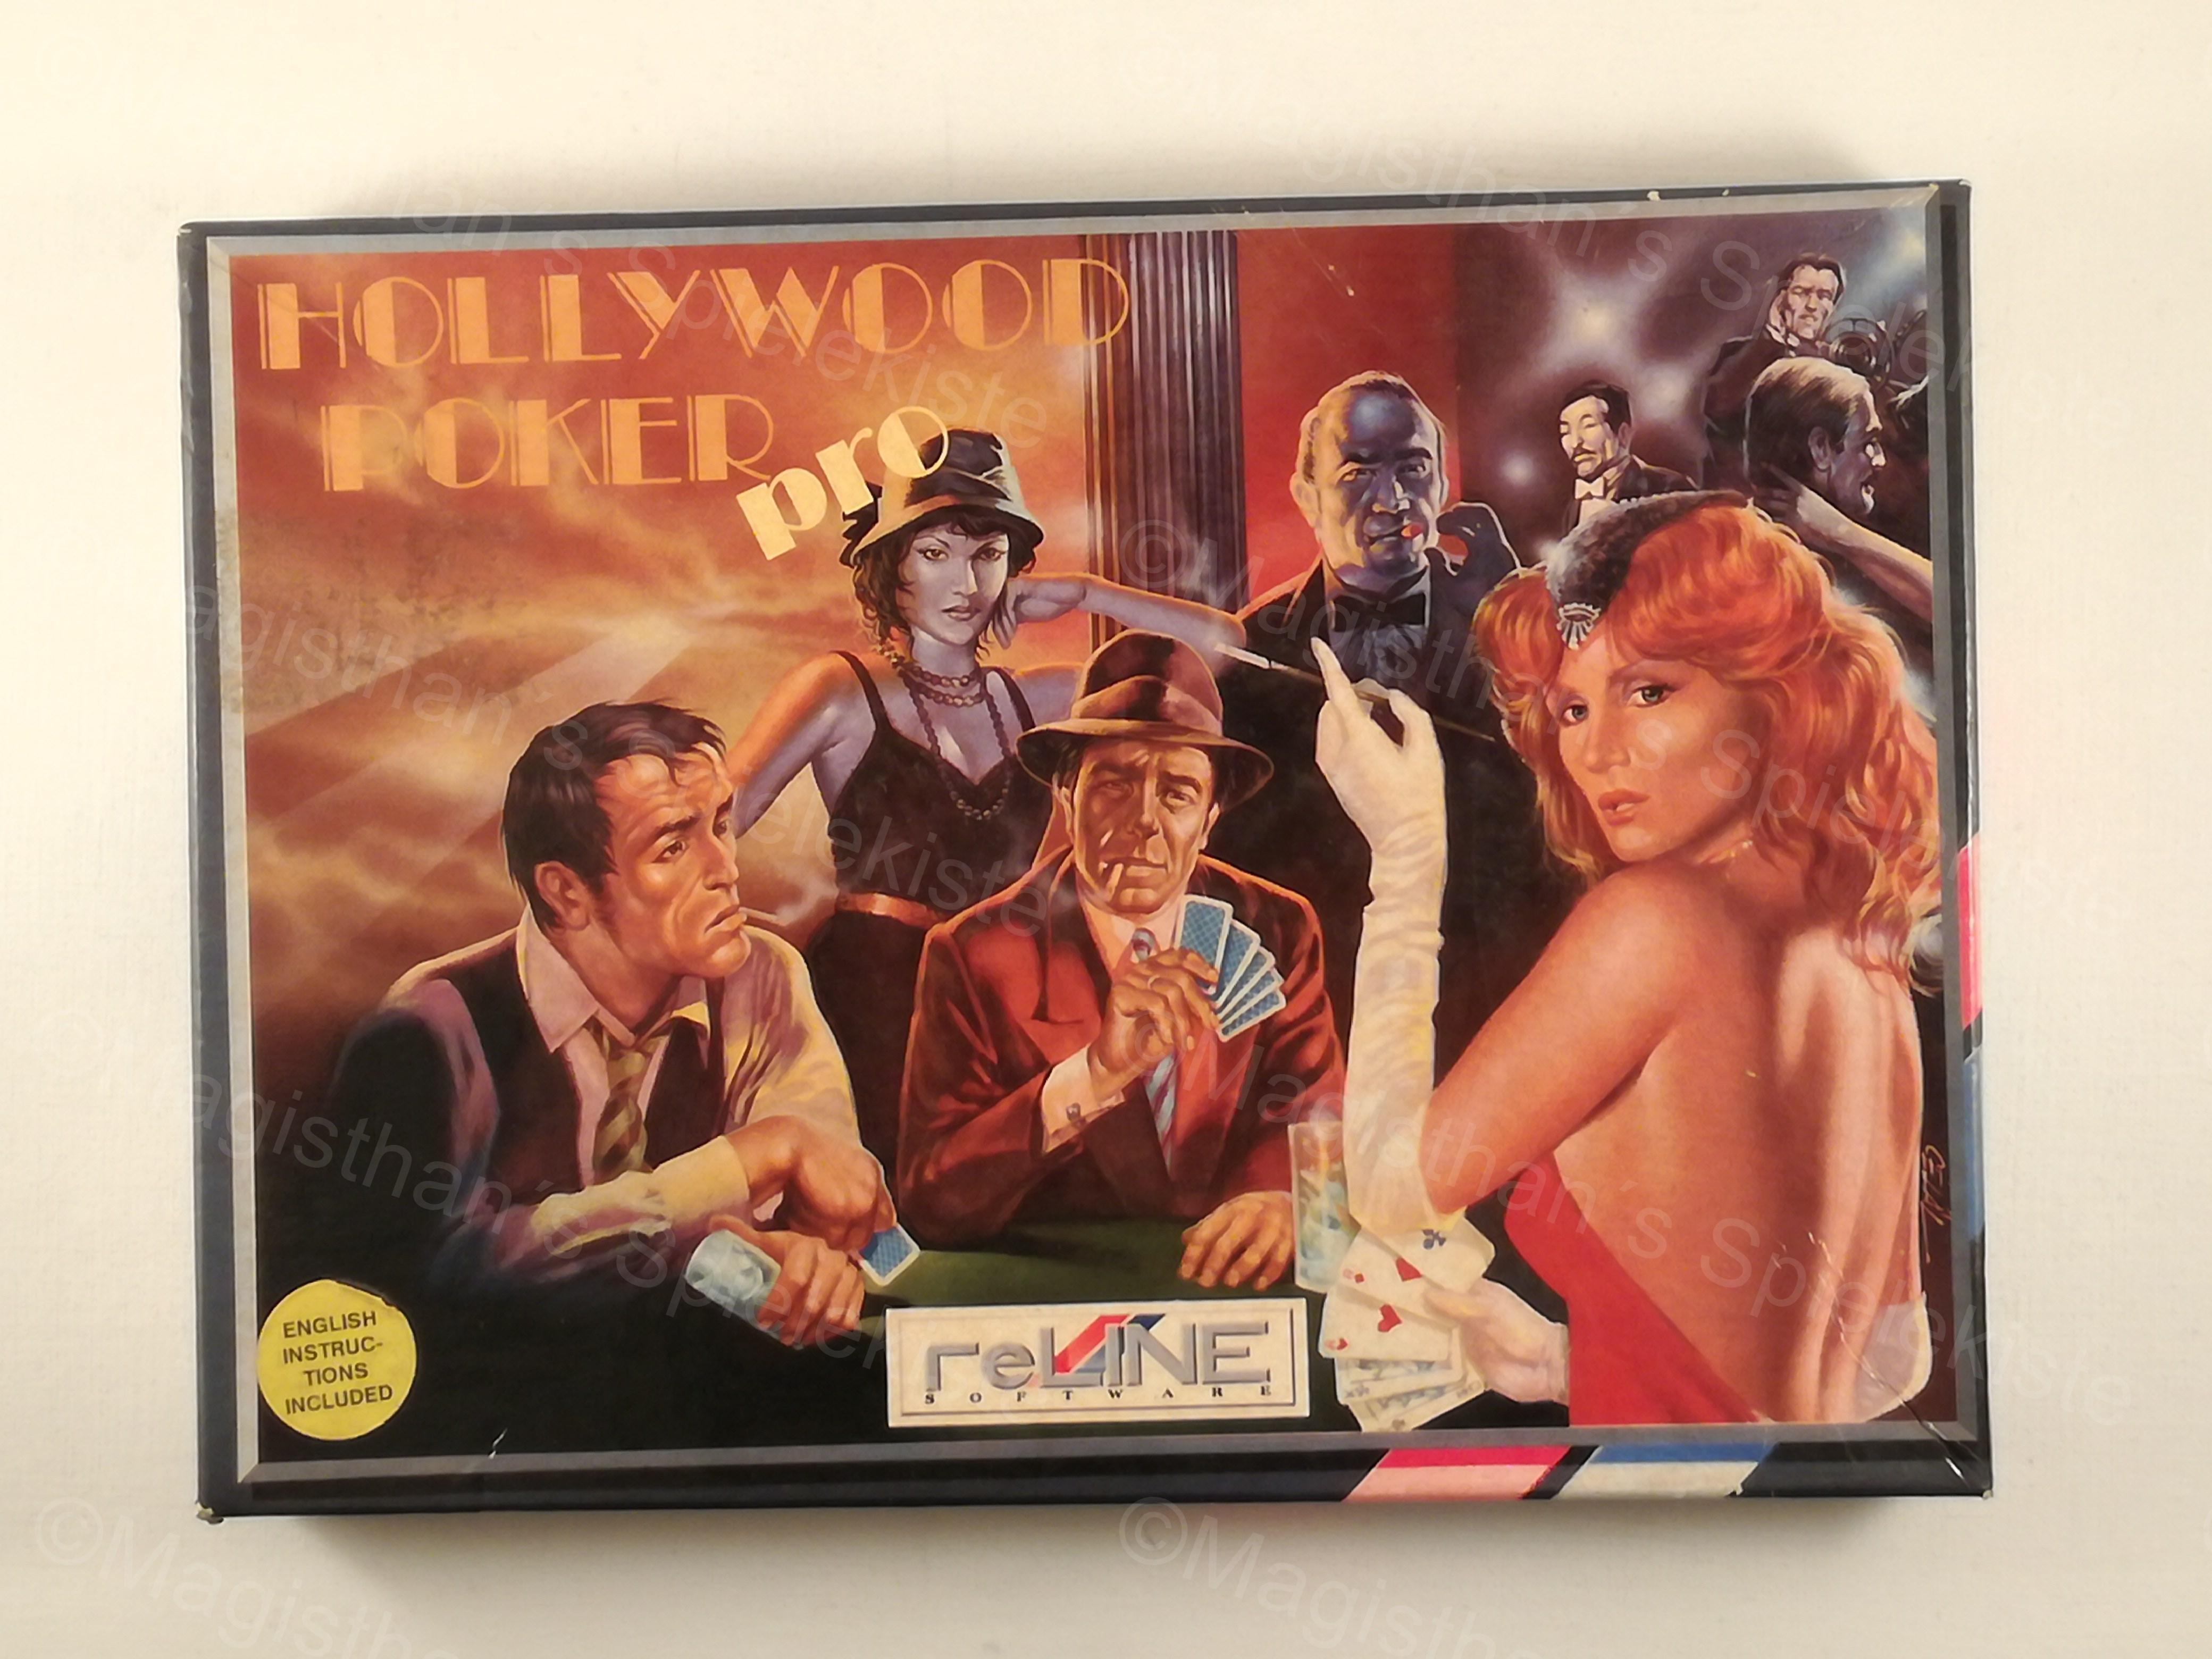 HollywoodPokerPro1_001.jpg